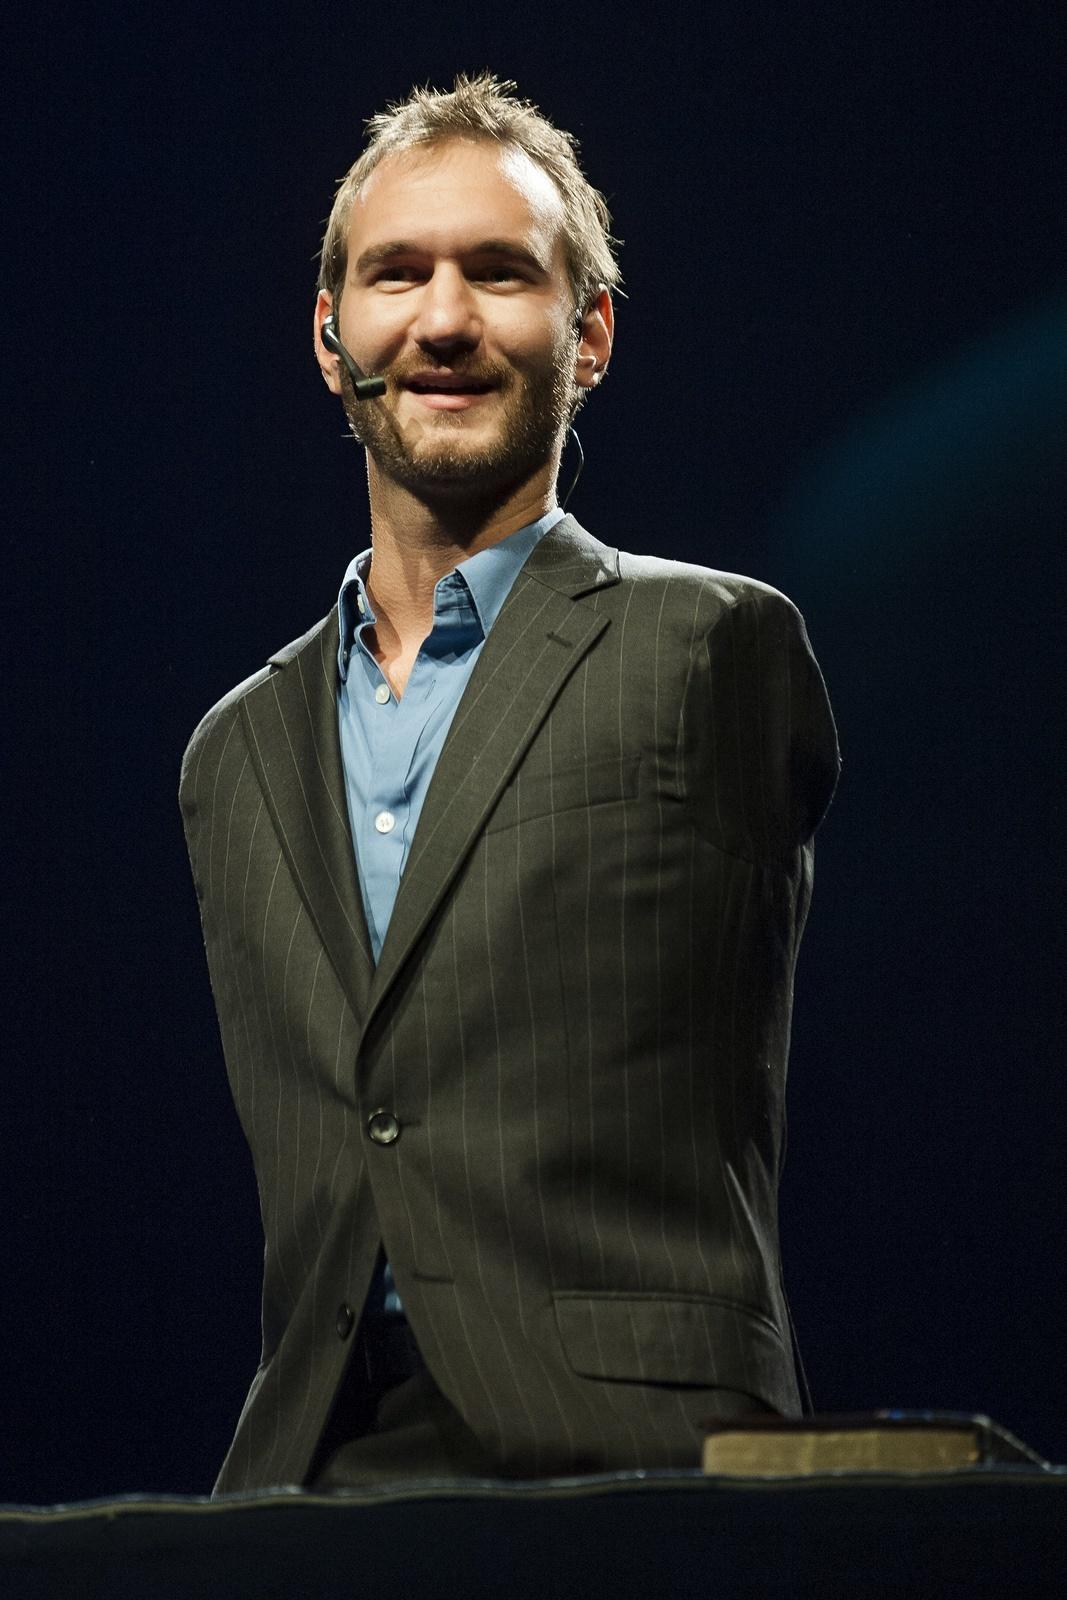 Nick Vujicic conférencier motivvant